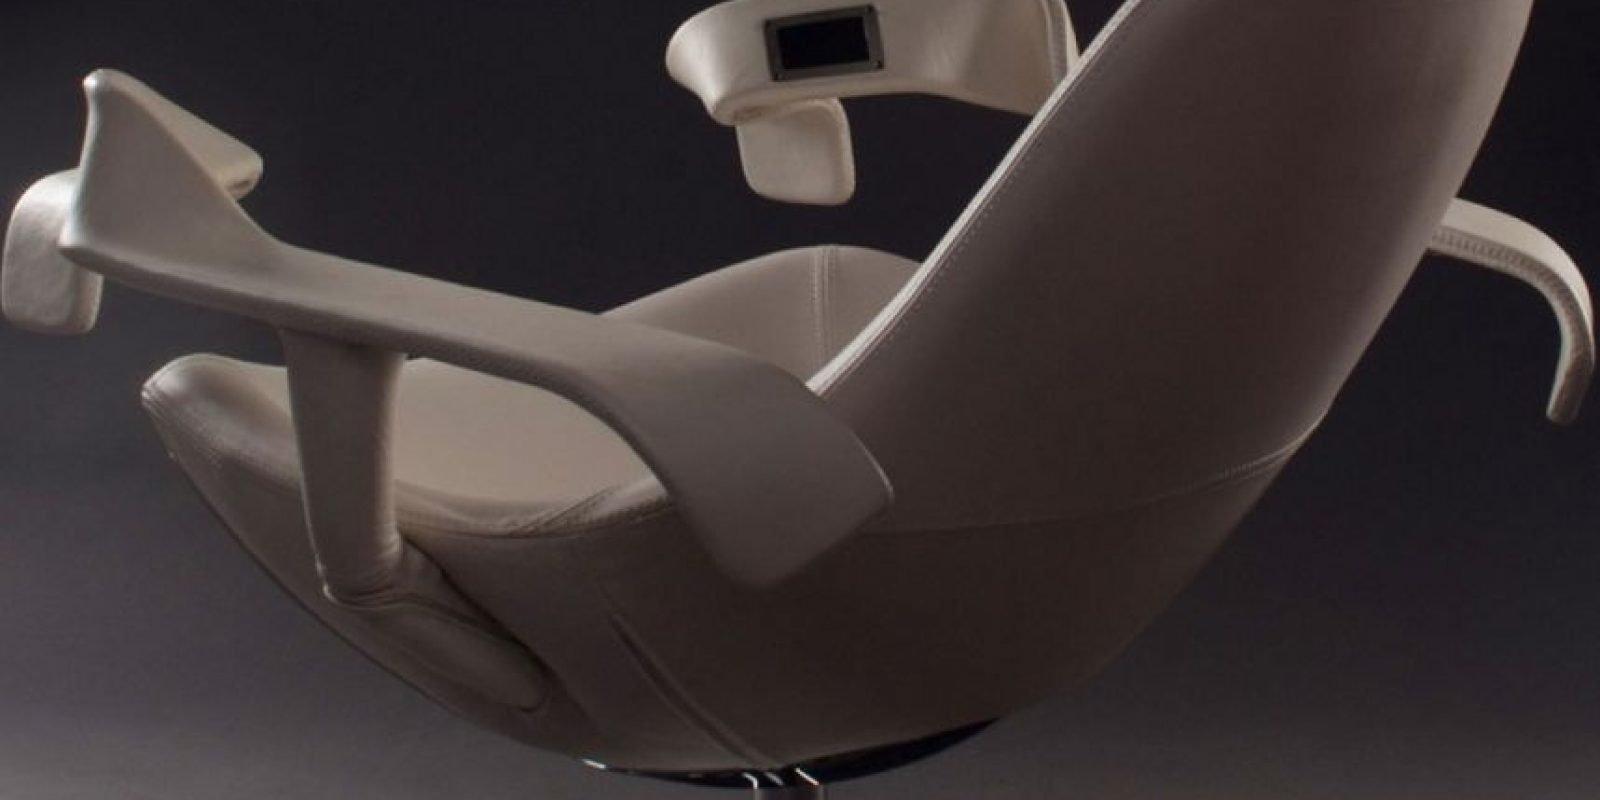 TAO Chair Foto:Tao Wellness